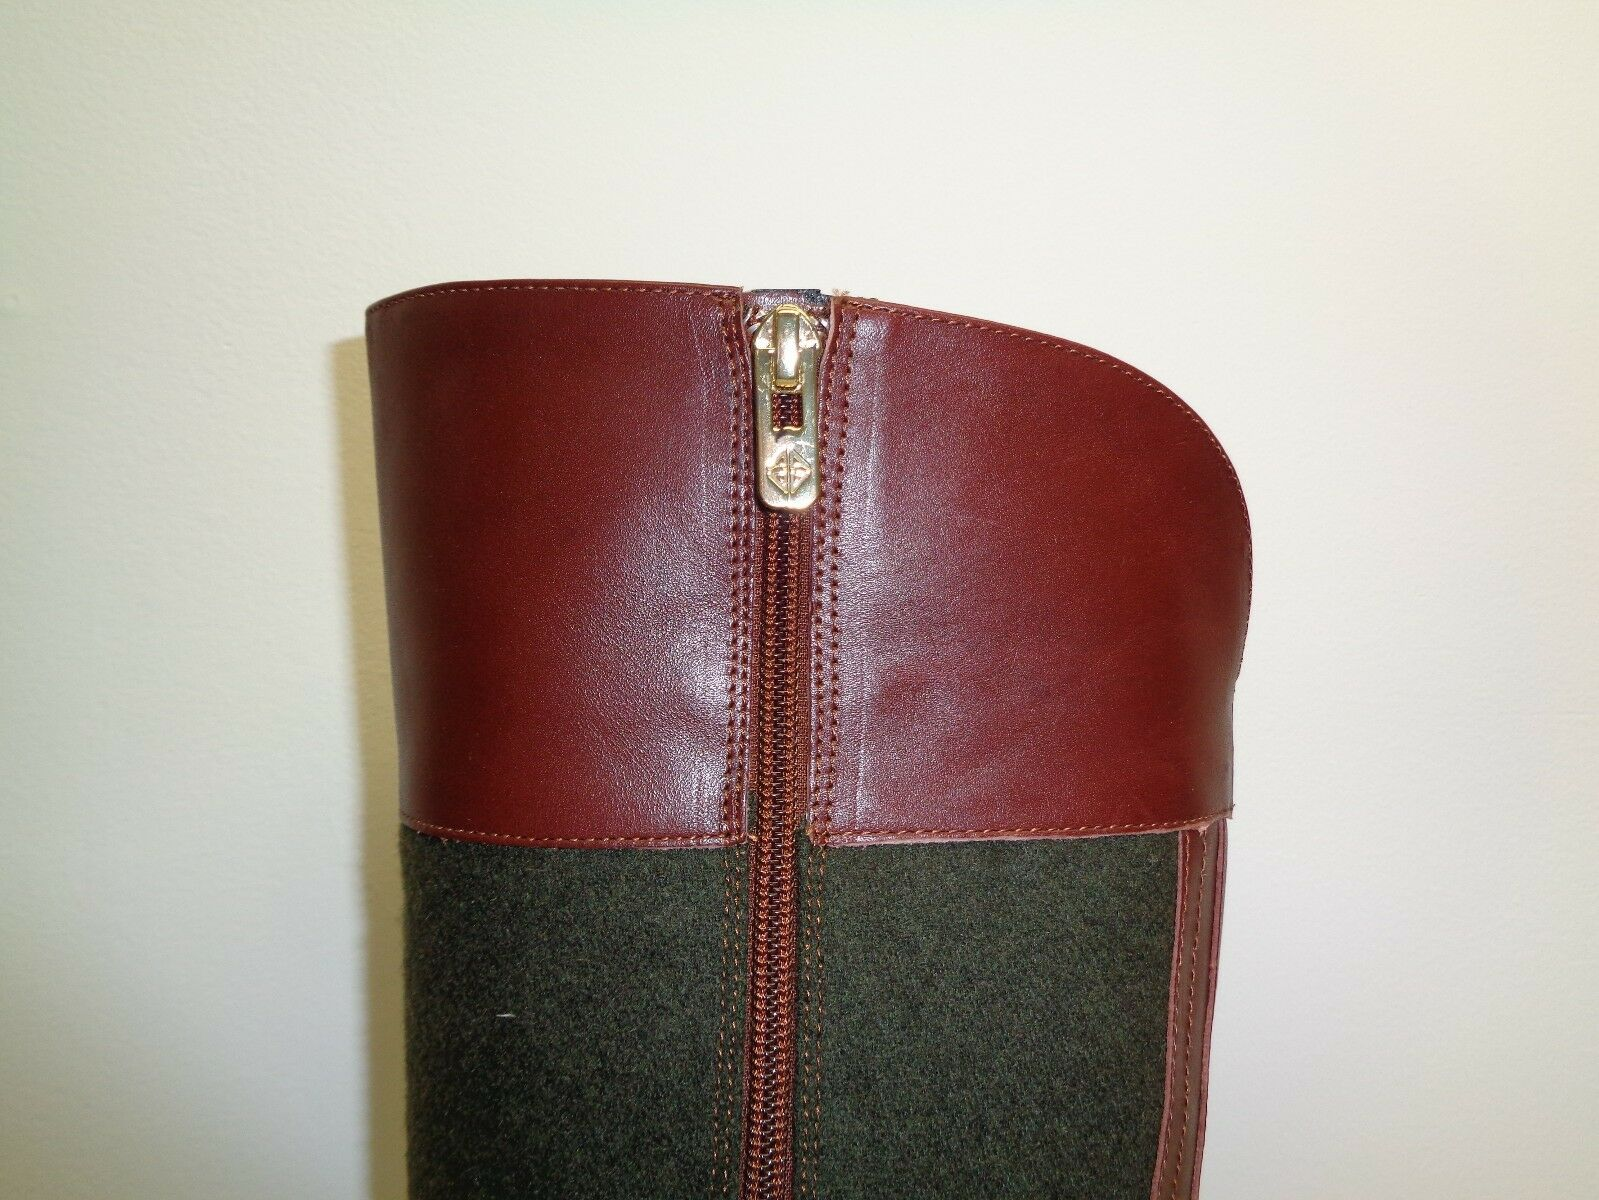 Antonio Melani Größe 6.5 Leder M ERNA Braun Sepia Leder 6.5 Wool Stiefel New Damenschuhe Schuhes 75addc